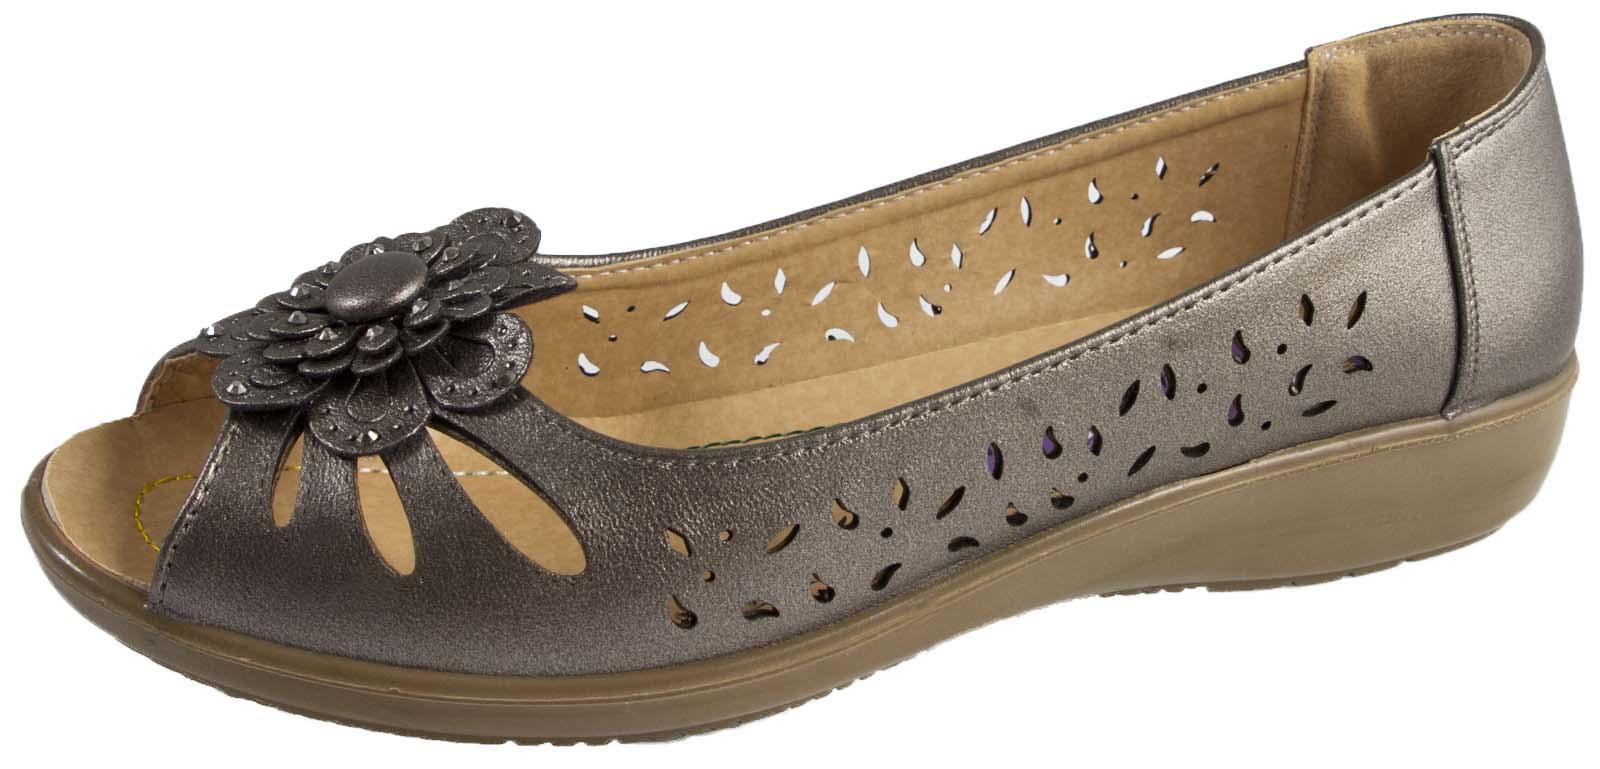 Excellent Crocs Isabella Huarache Flat Womens Slip On Sandals Shoes Size UK 4-8 | EBay